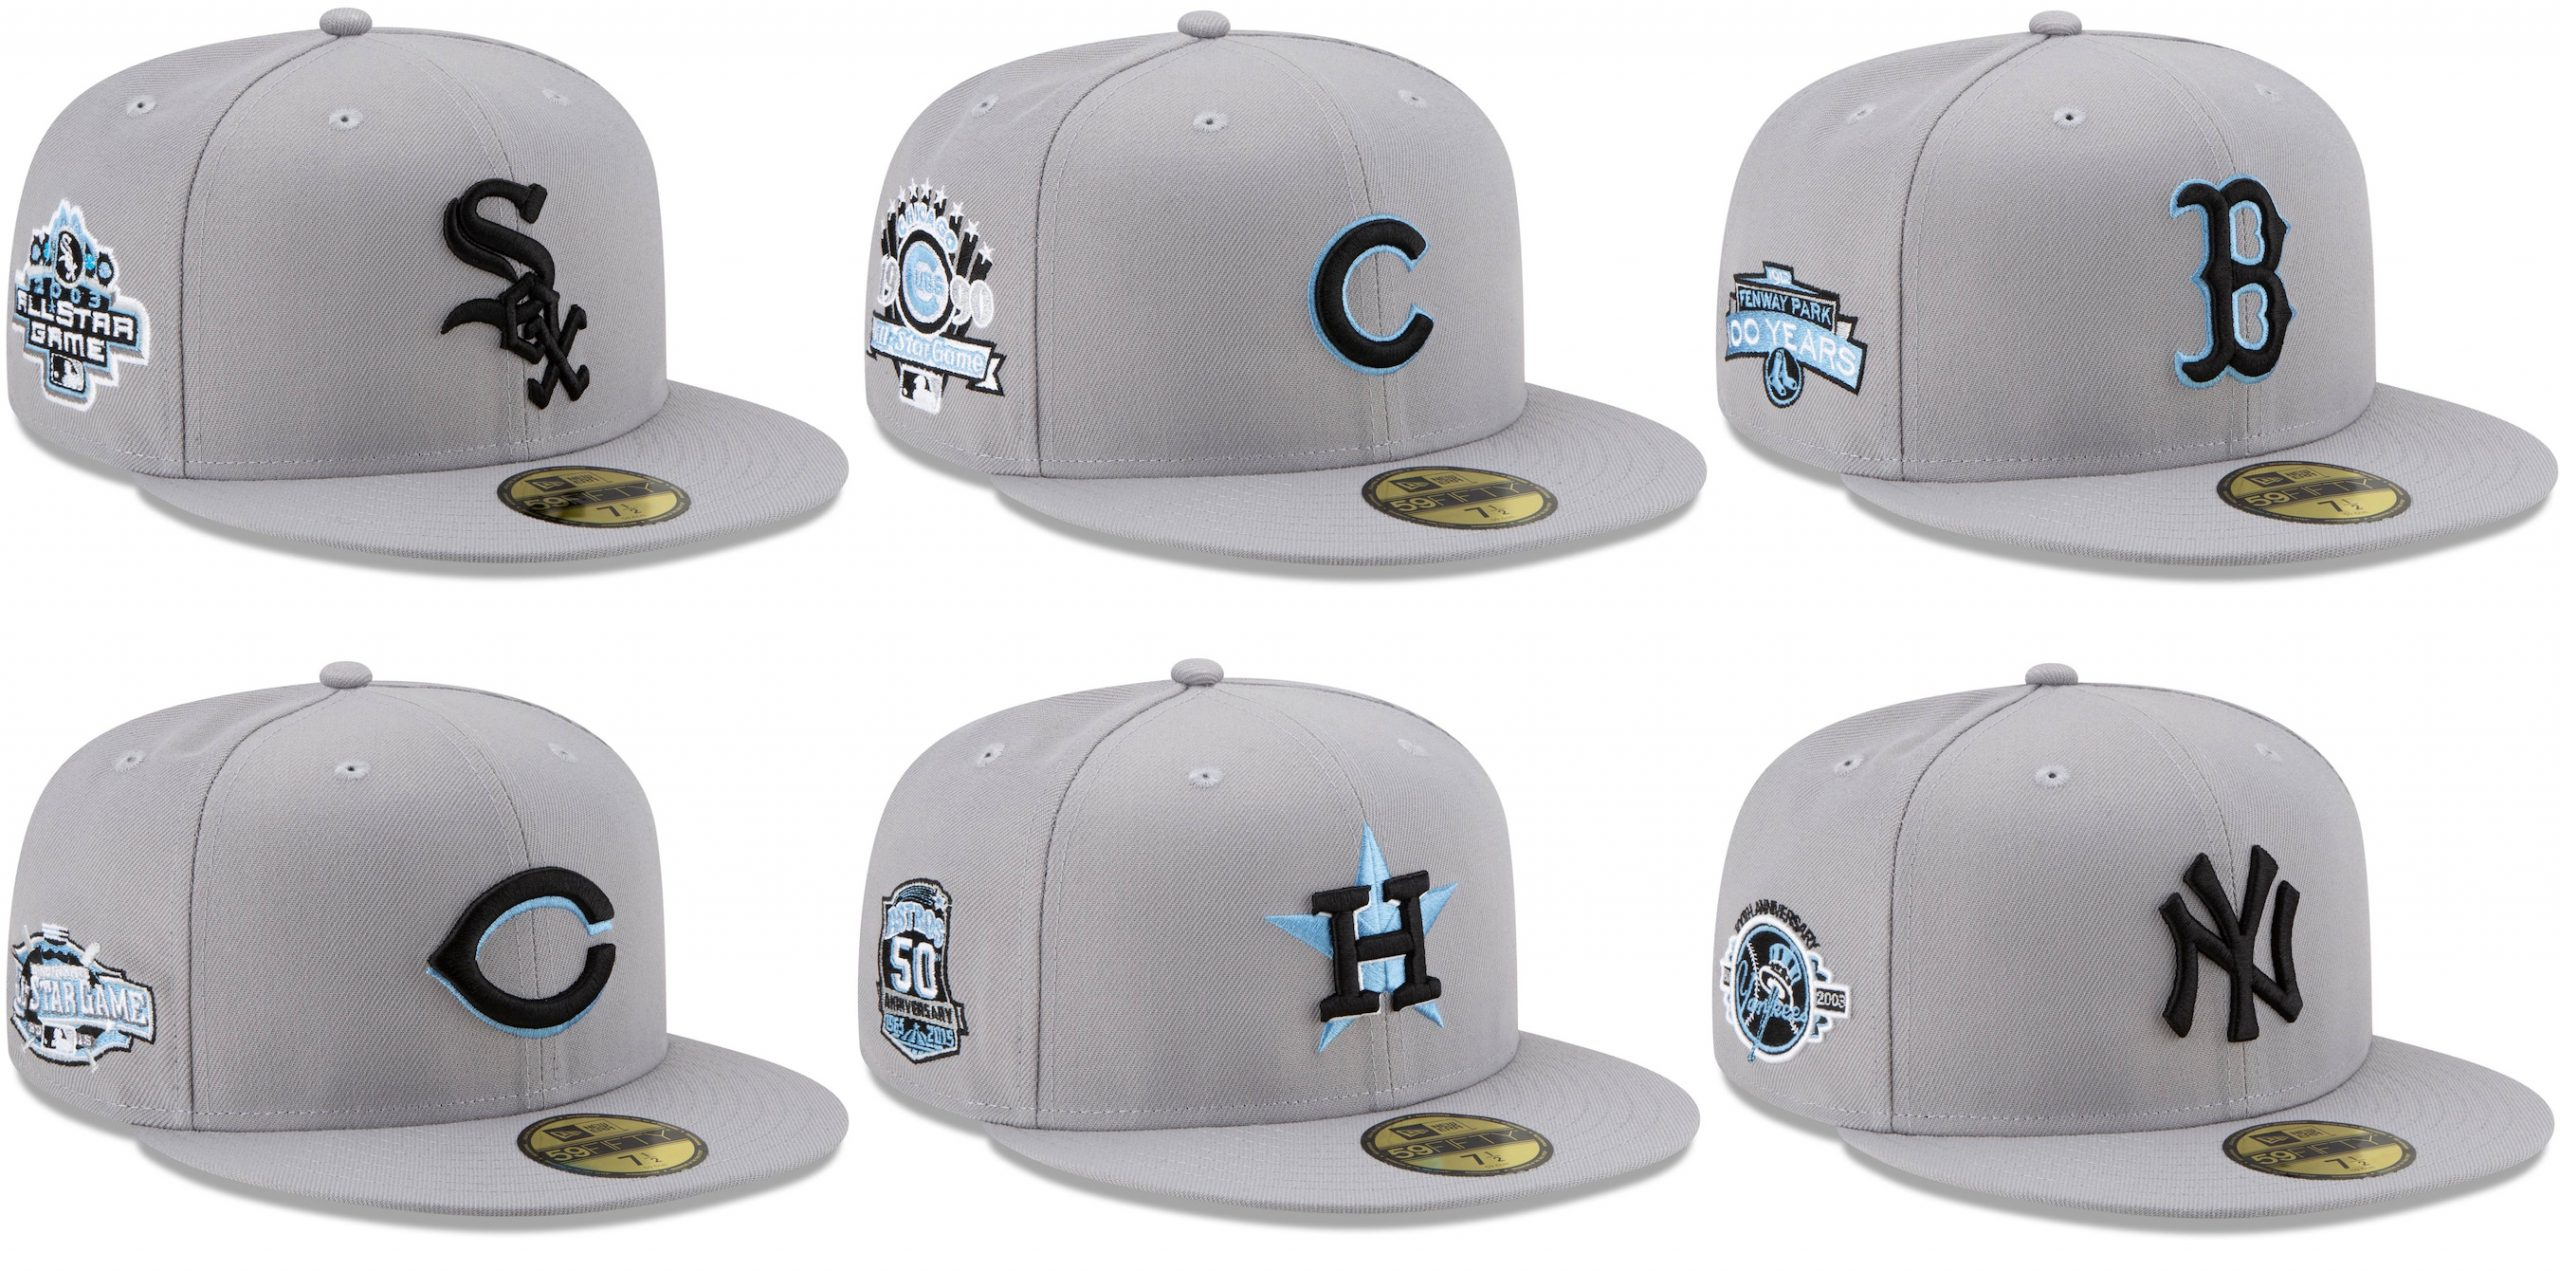 jordan-4-university-blue-mlb-fitted-hats